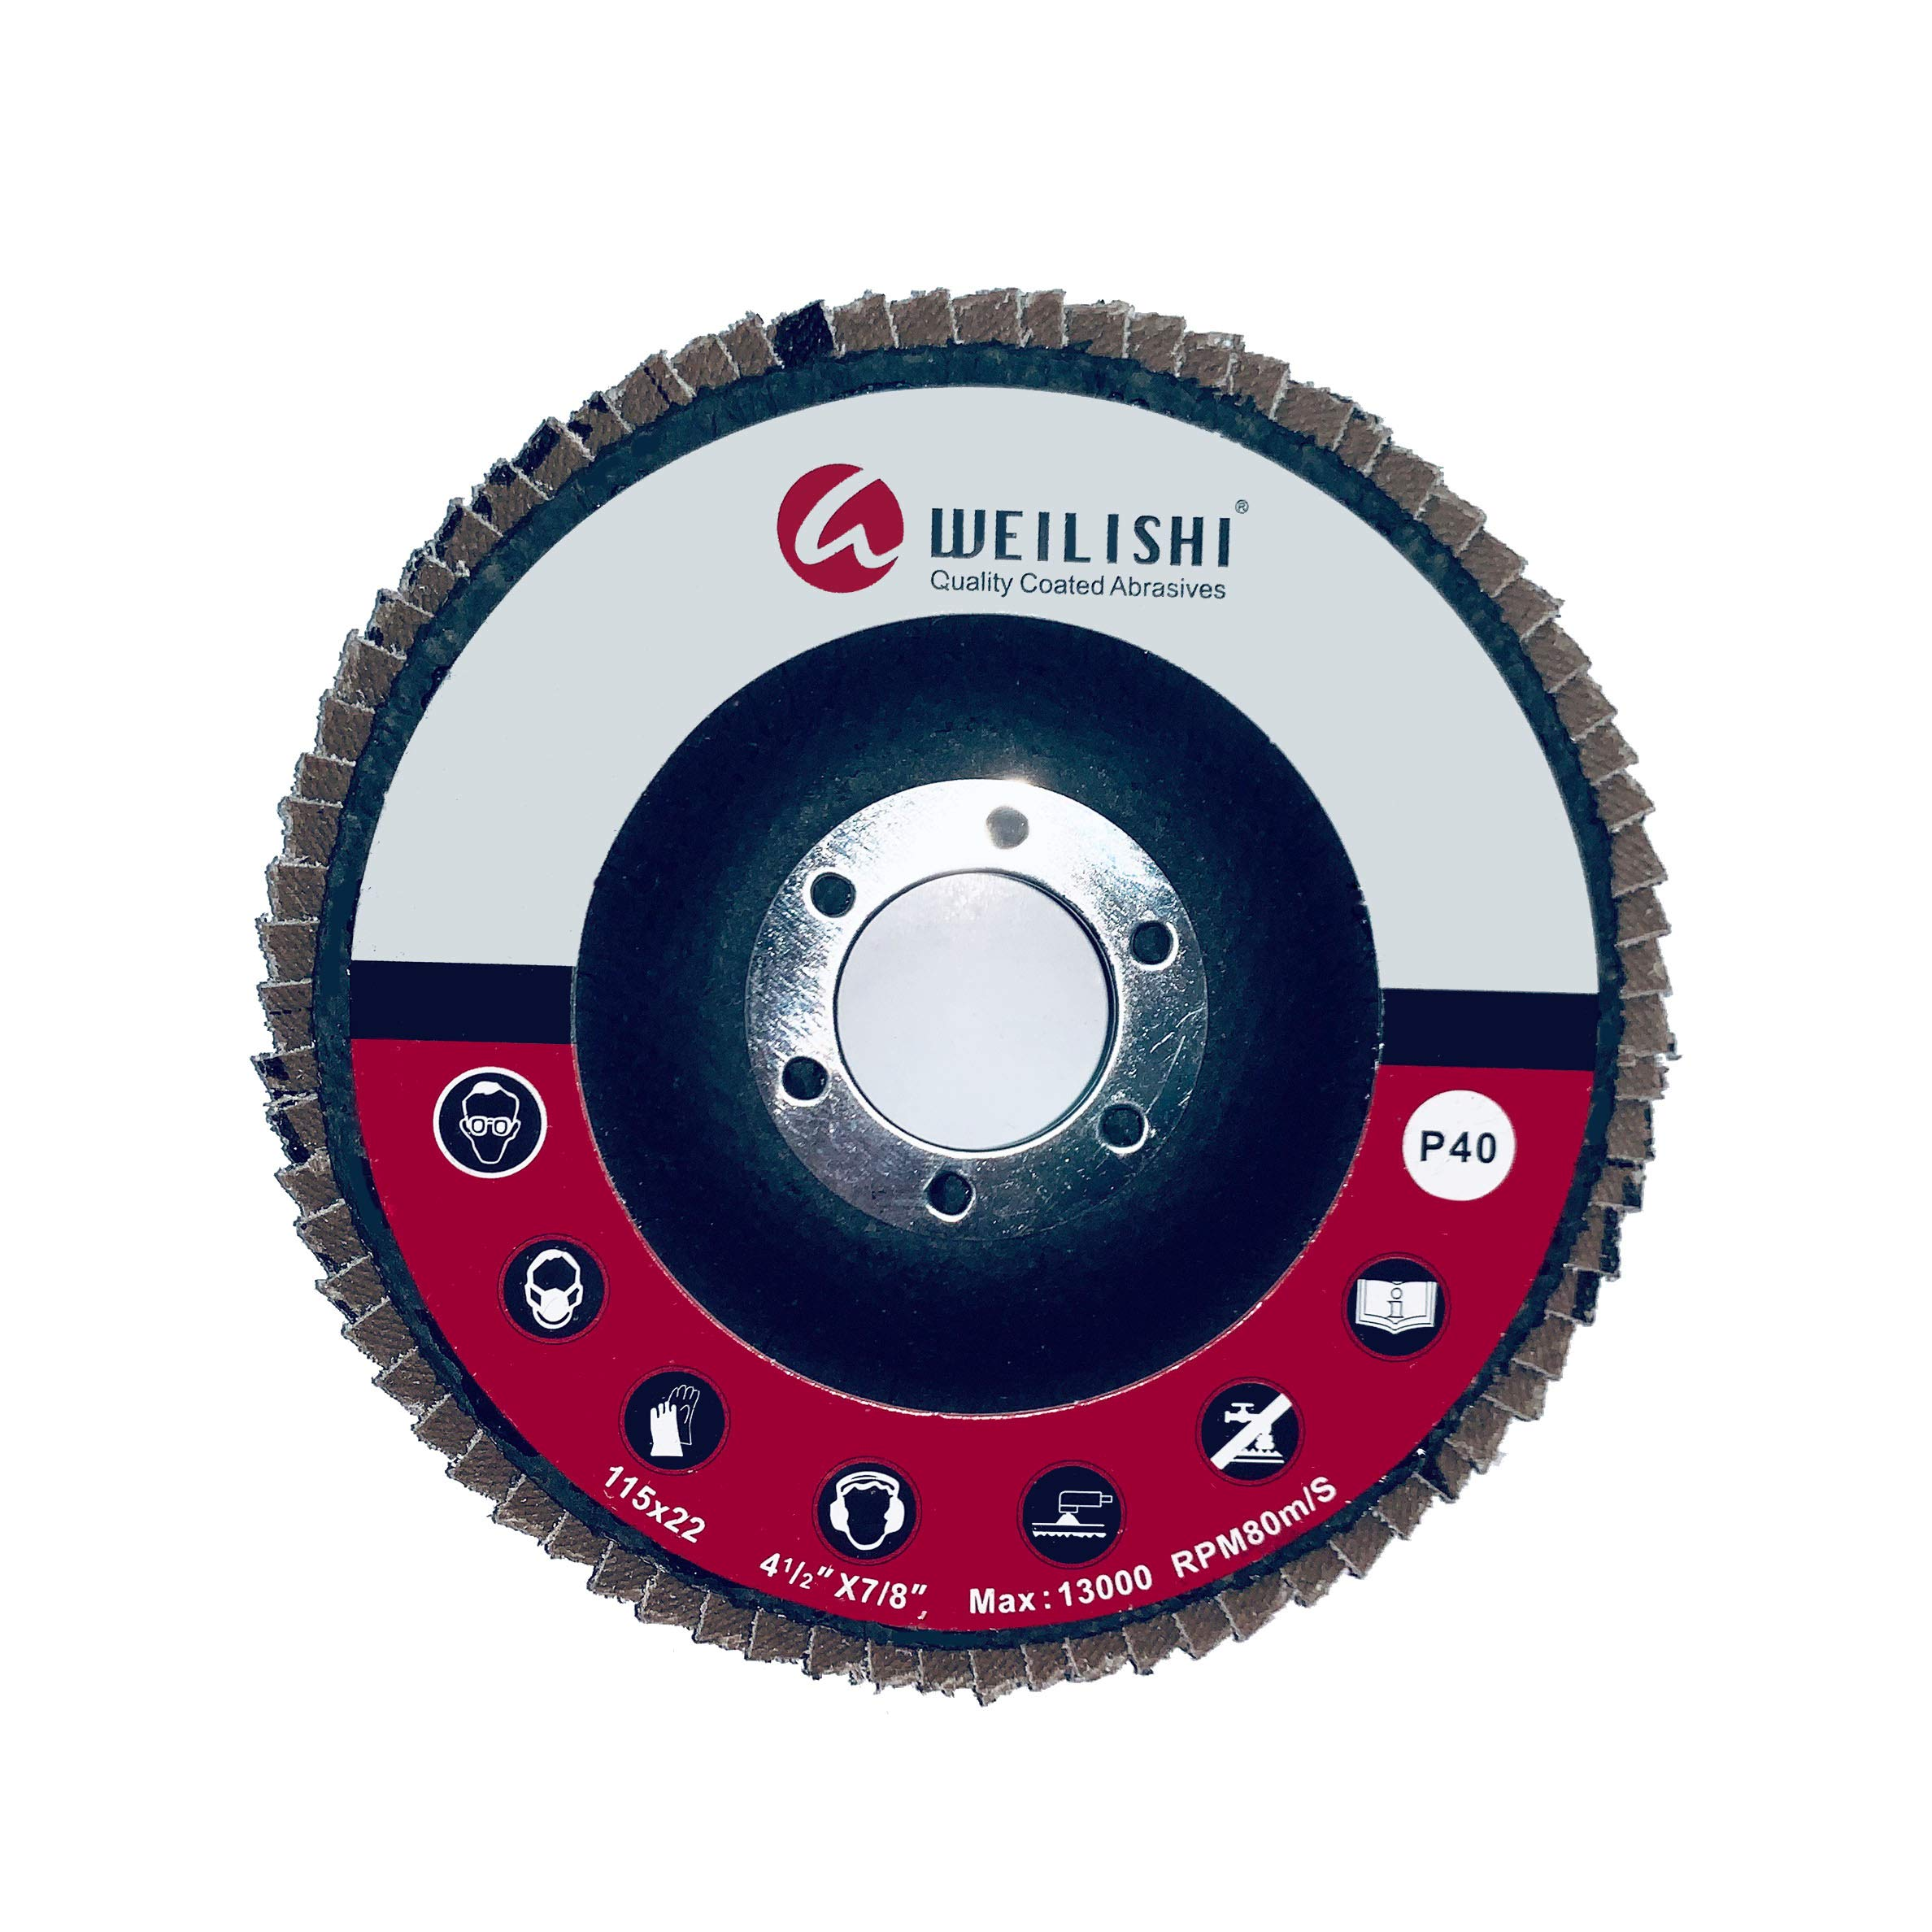 10 Pack - WEILISHI 4.5'' x 7/8'' Premium Germany VSM Zirconia Abrasive Flap Disc 4-1/2 Inch, Grit 40, T27